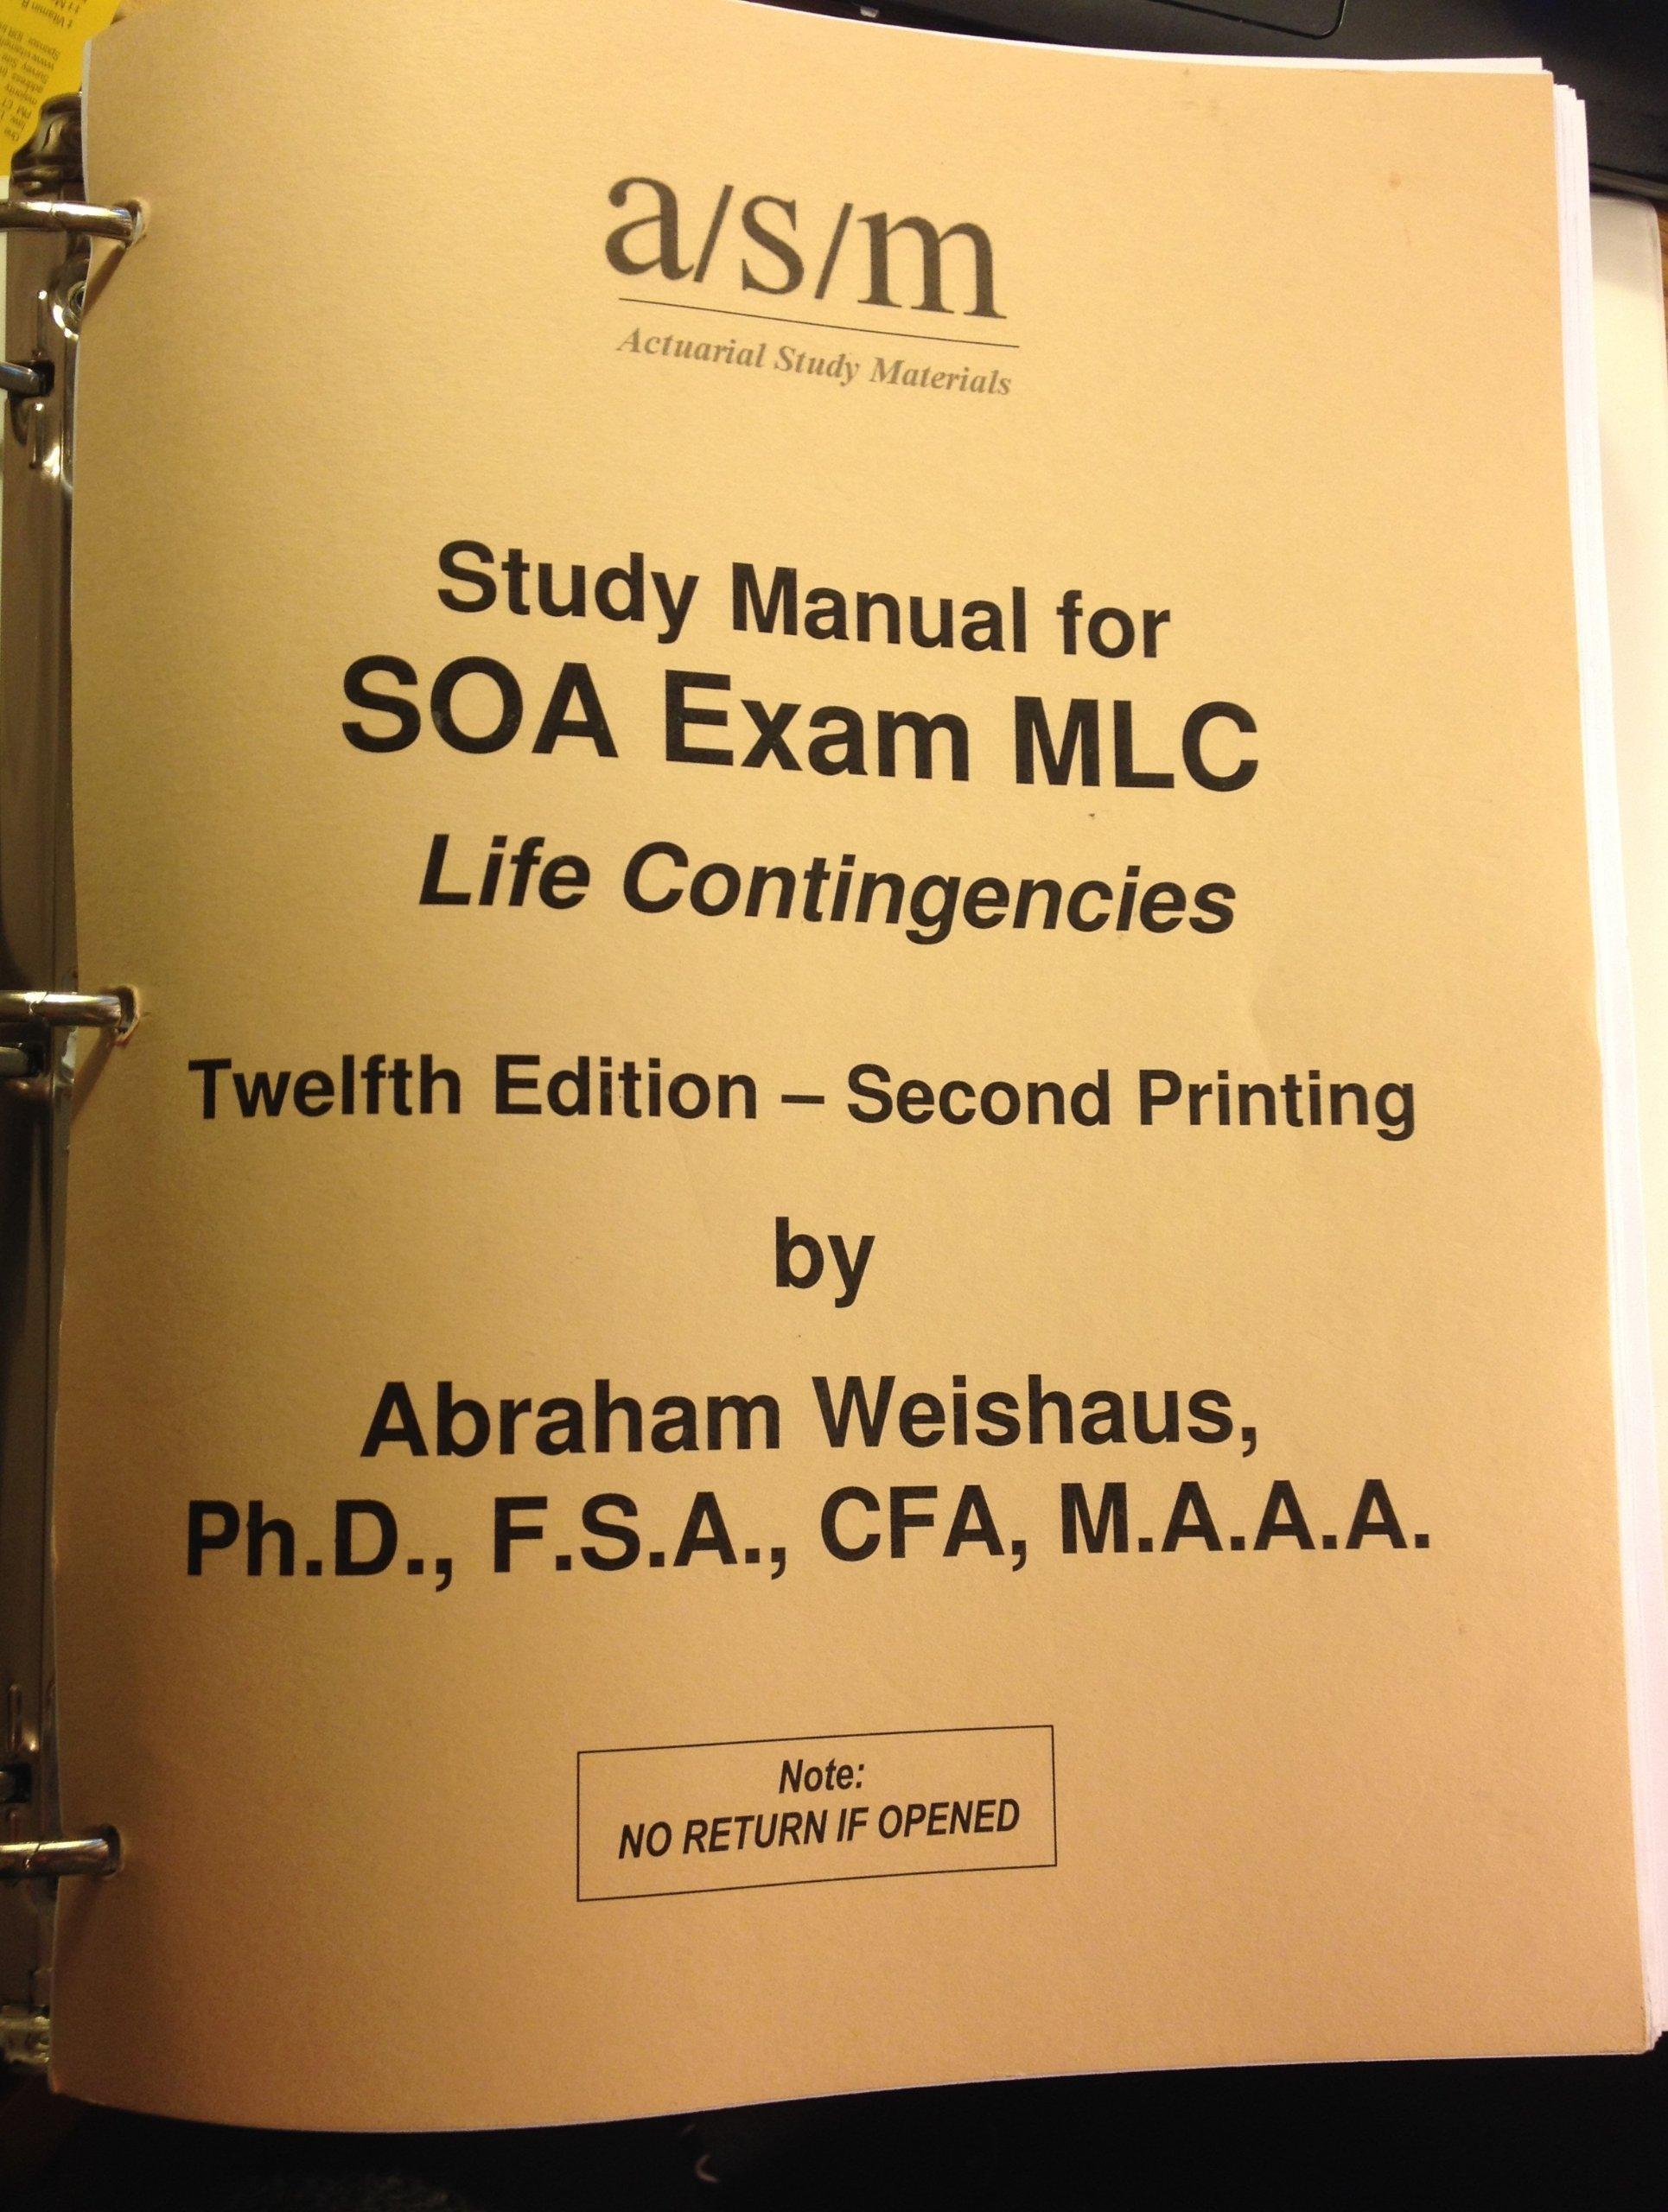 asm study manual for soa exam mlc life contingencies 12th edition rh amazon com asm mlc study manual pdf Daance Study Manual